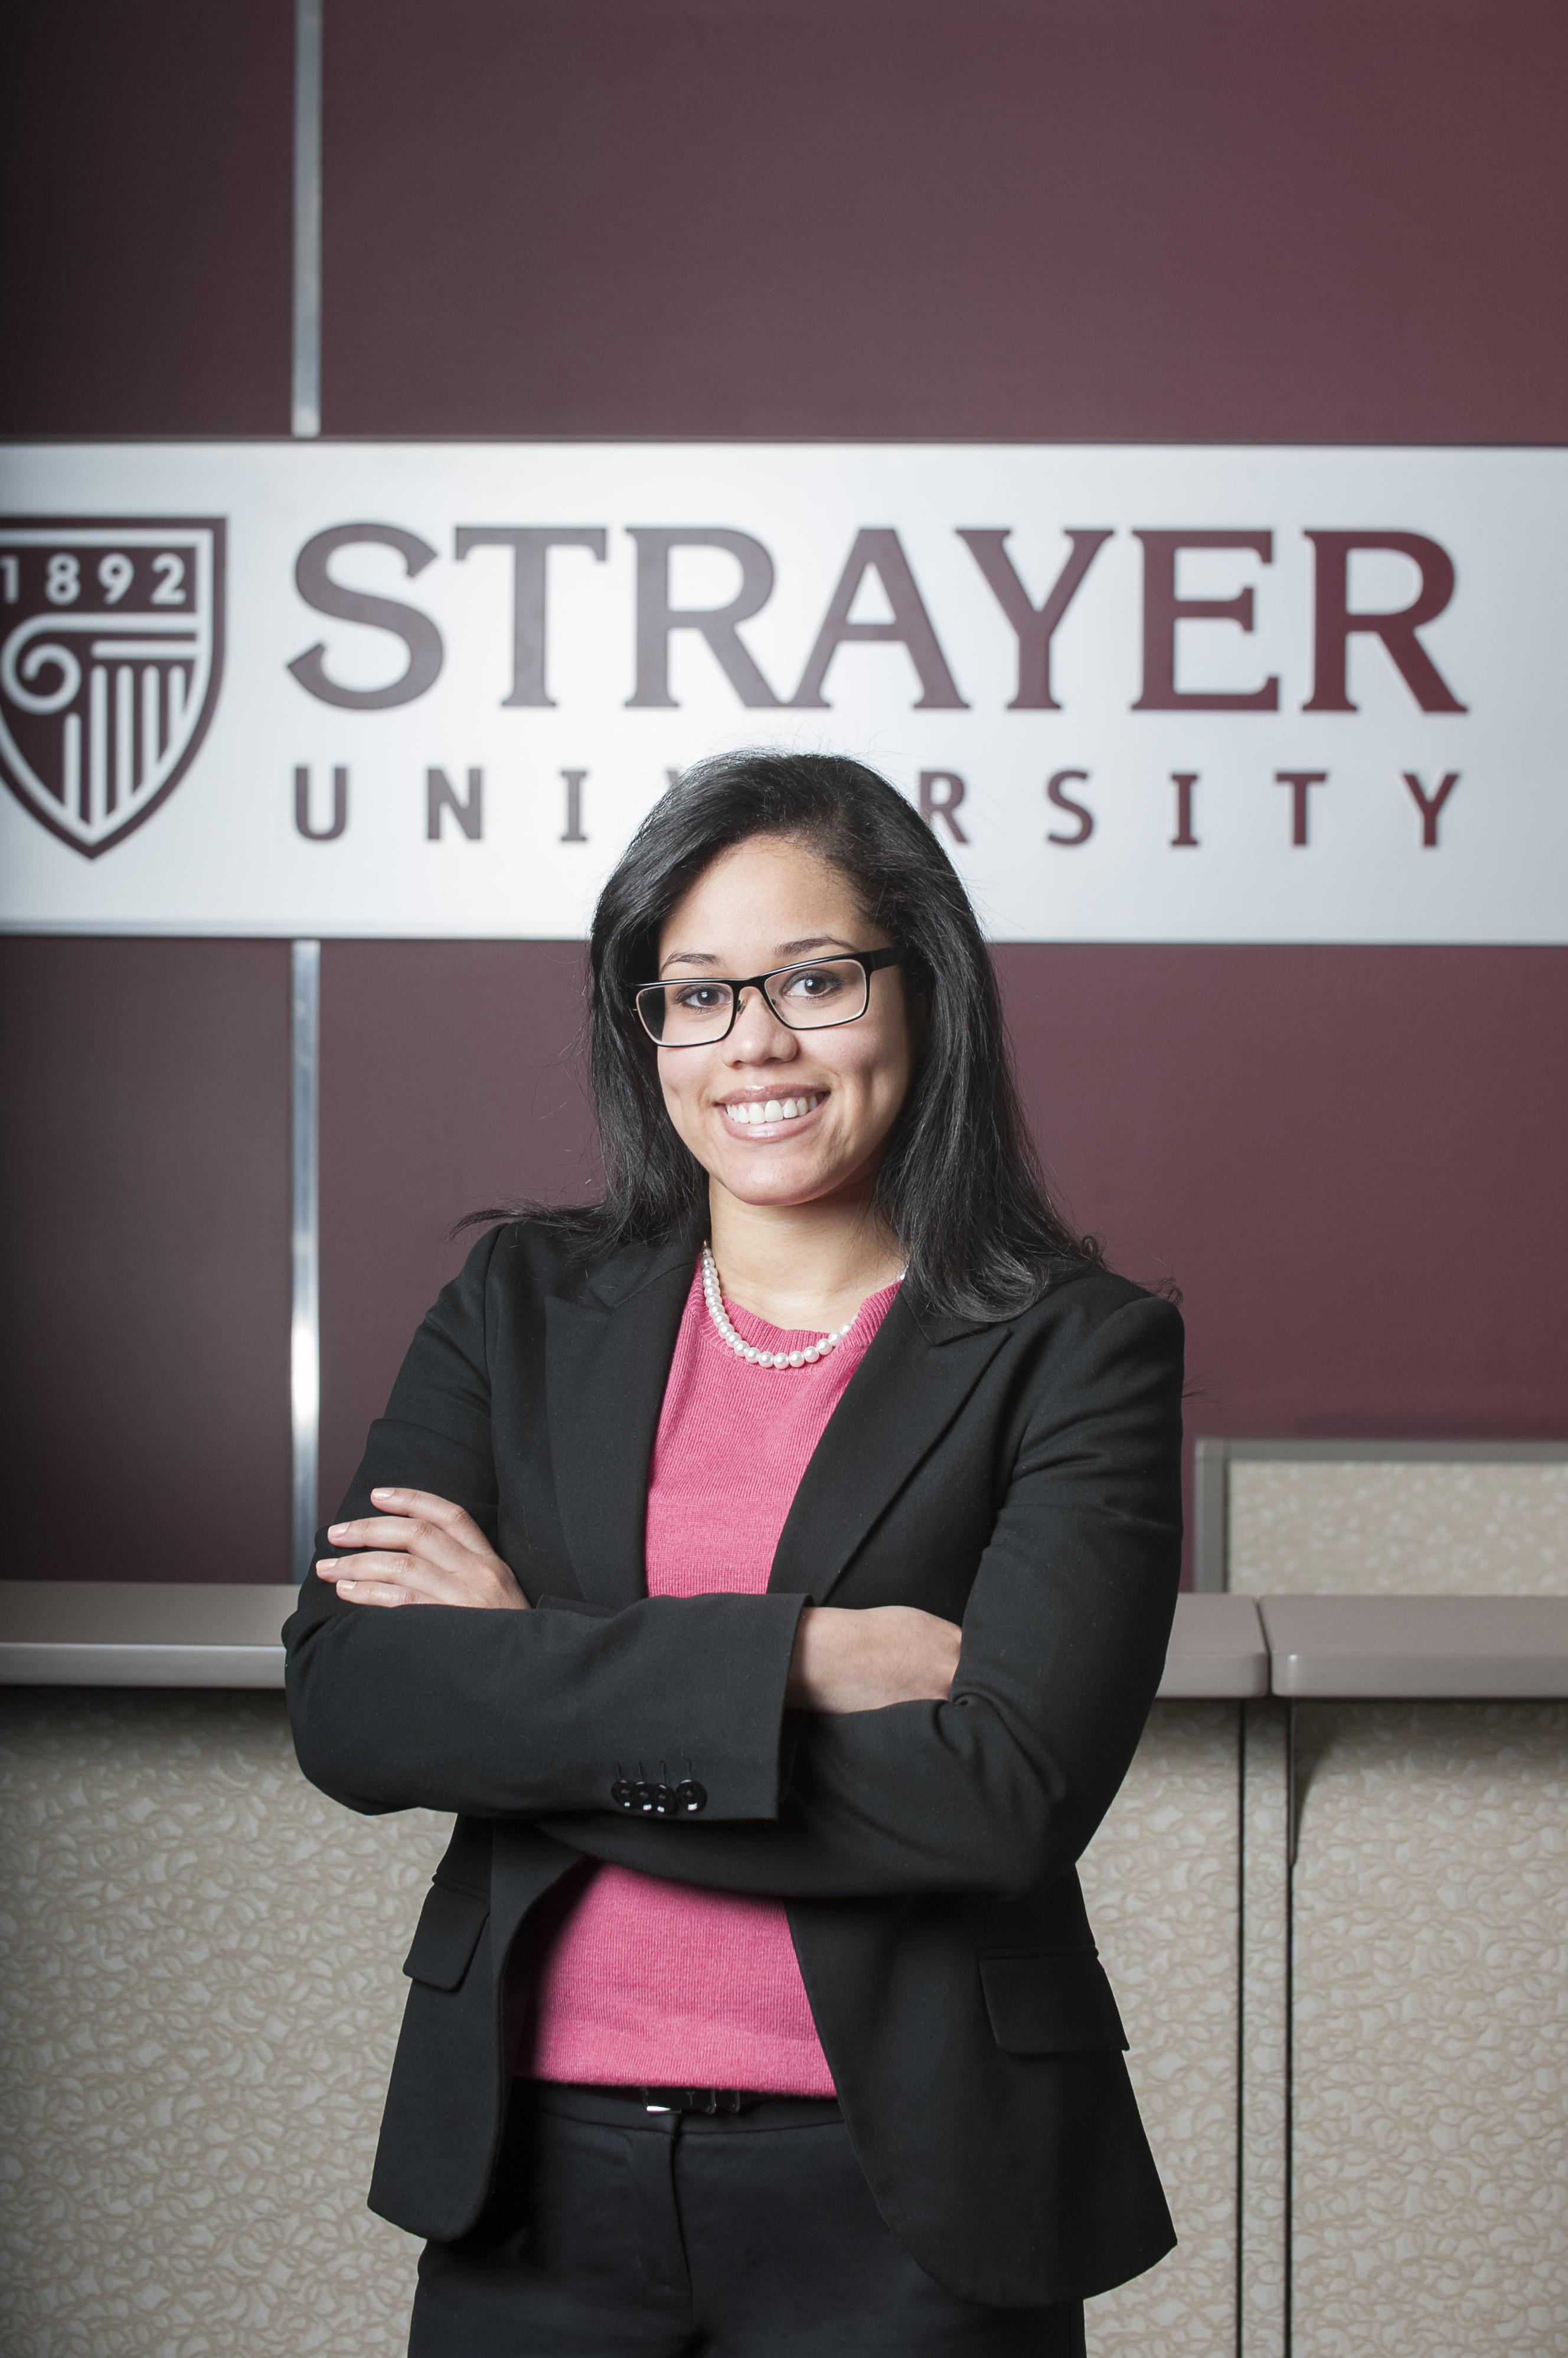 Strayer University Partners with Hispanicize 2014 to Bring ...